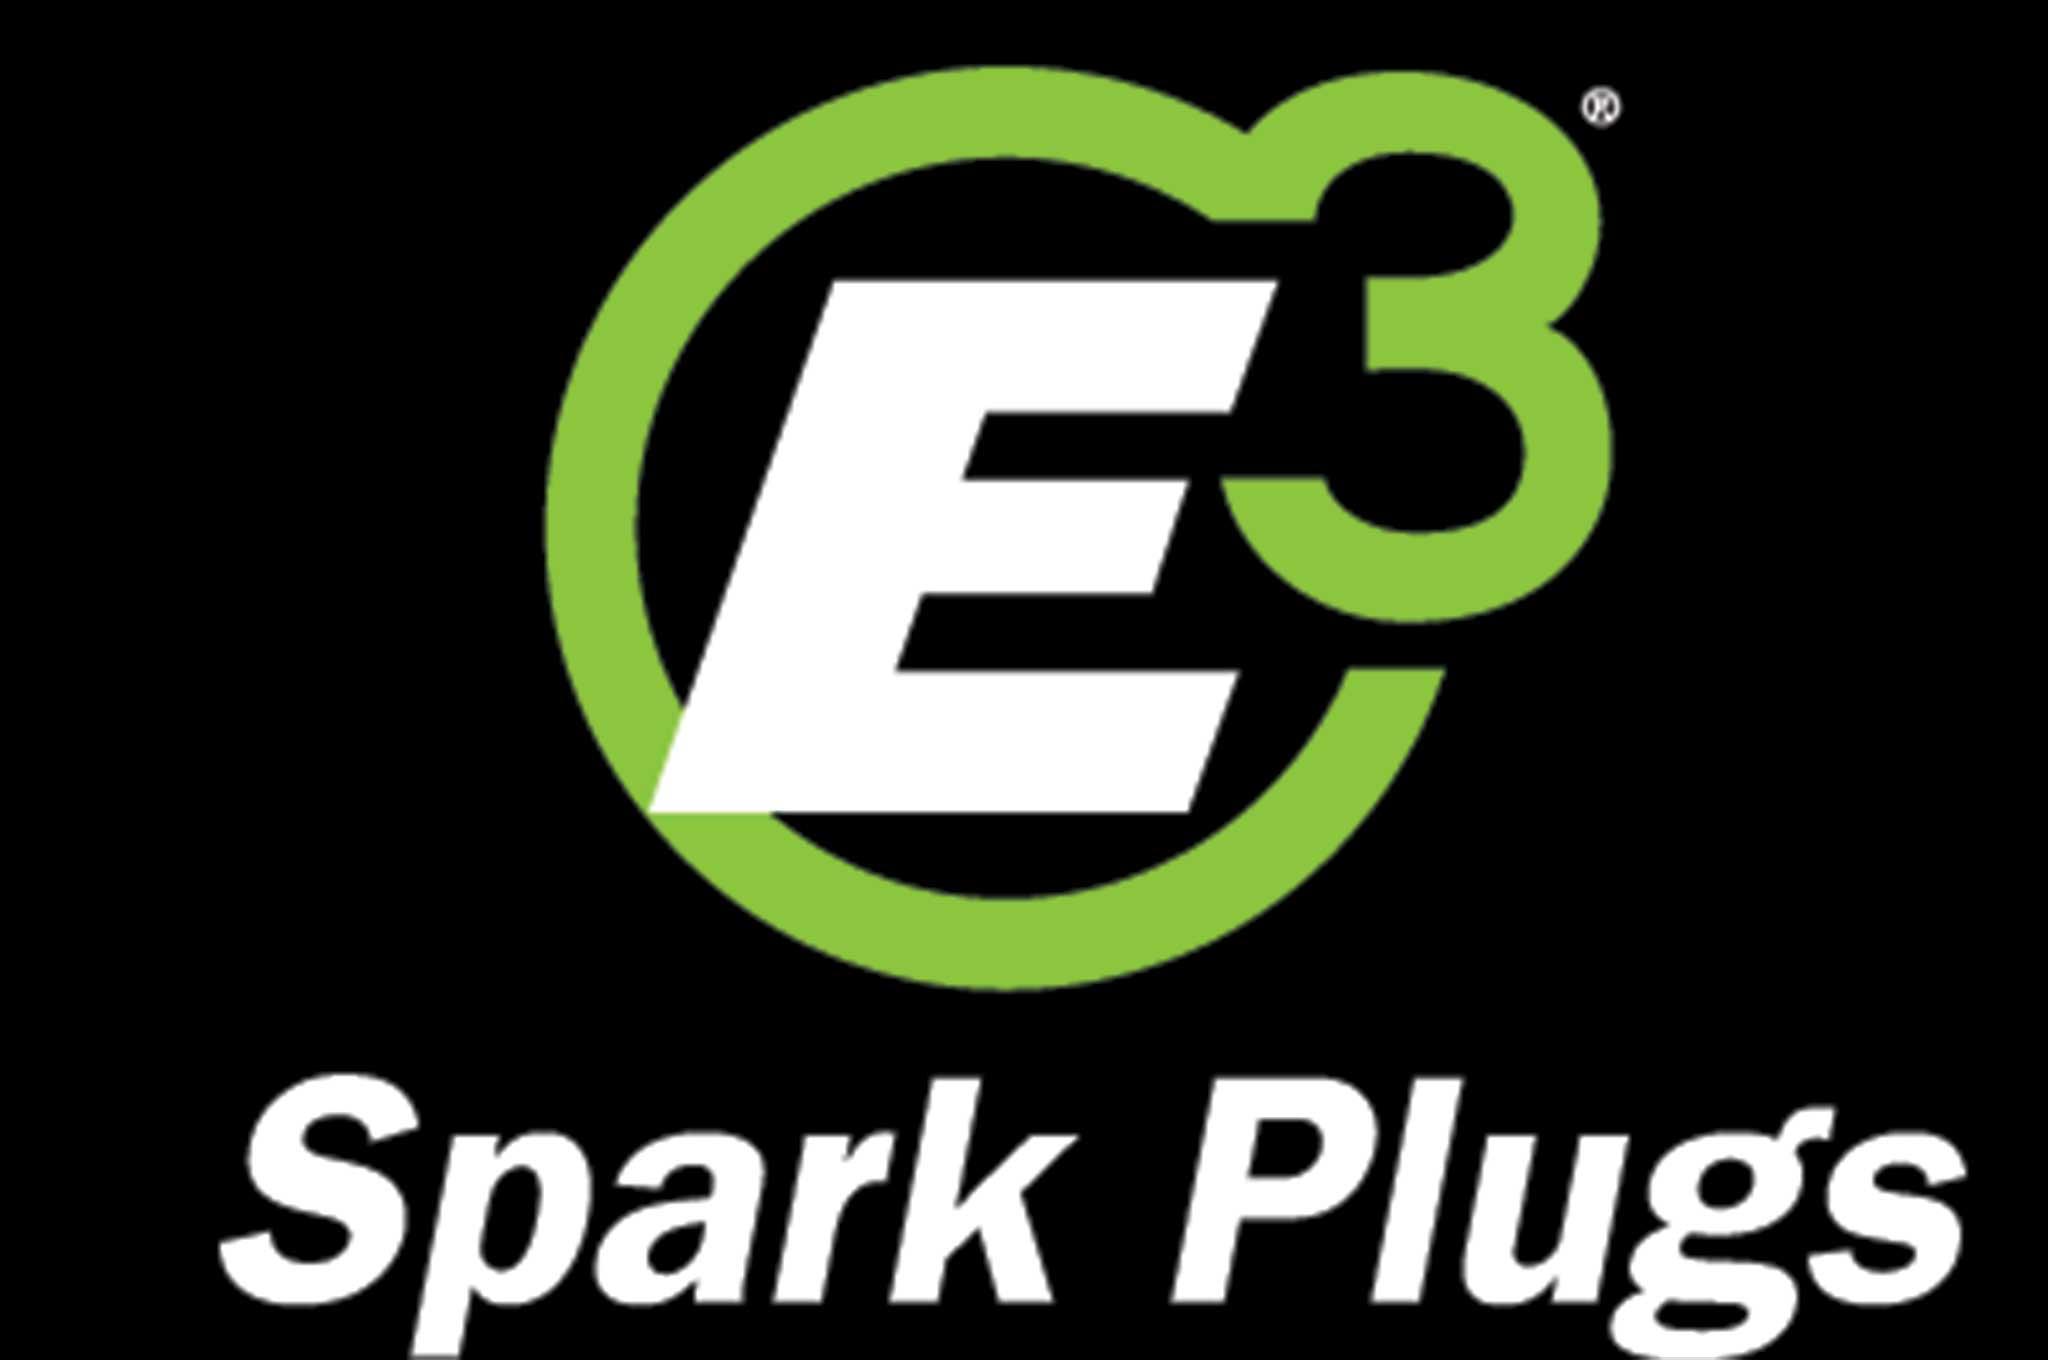 e3-spark-plugs-logo